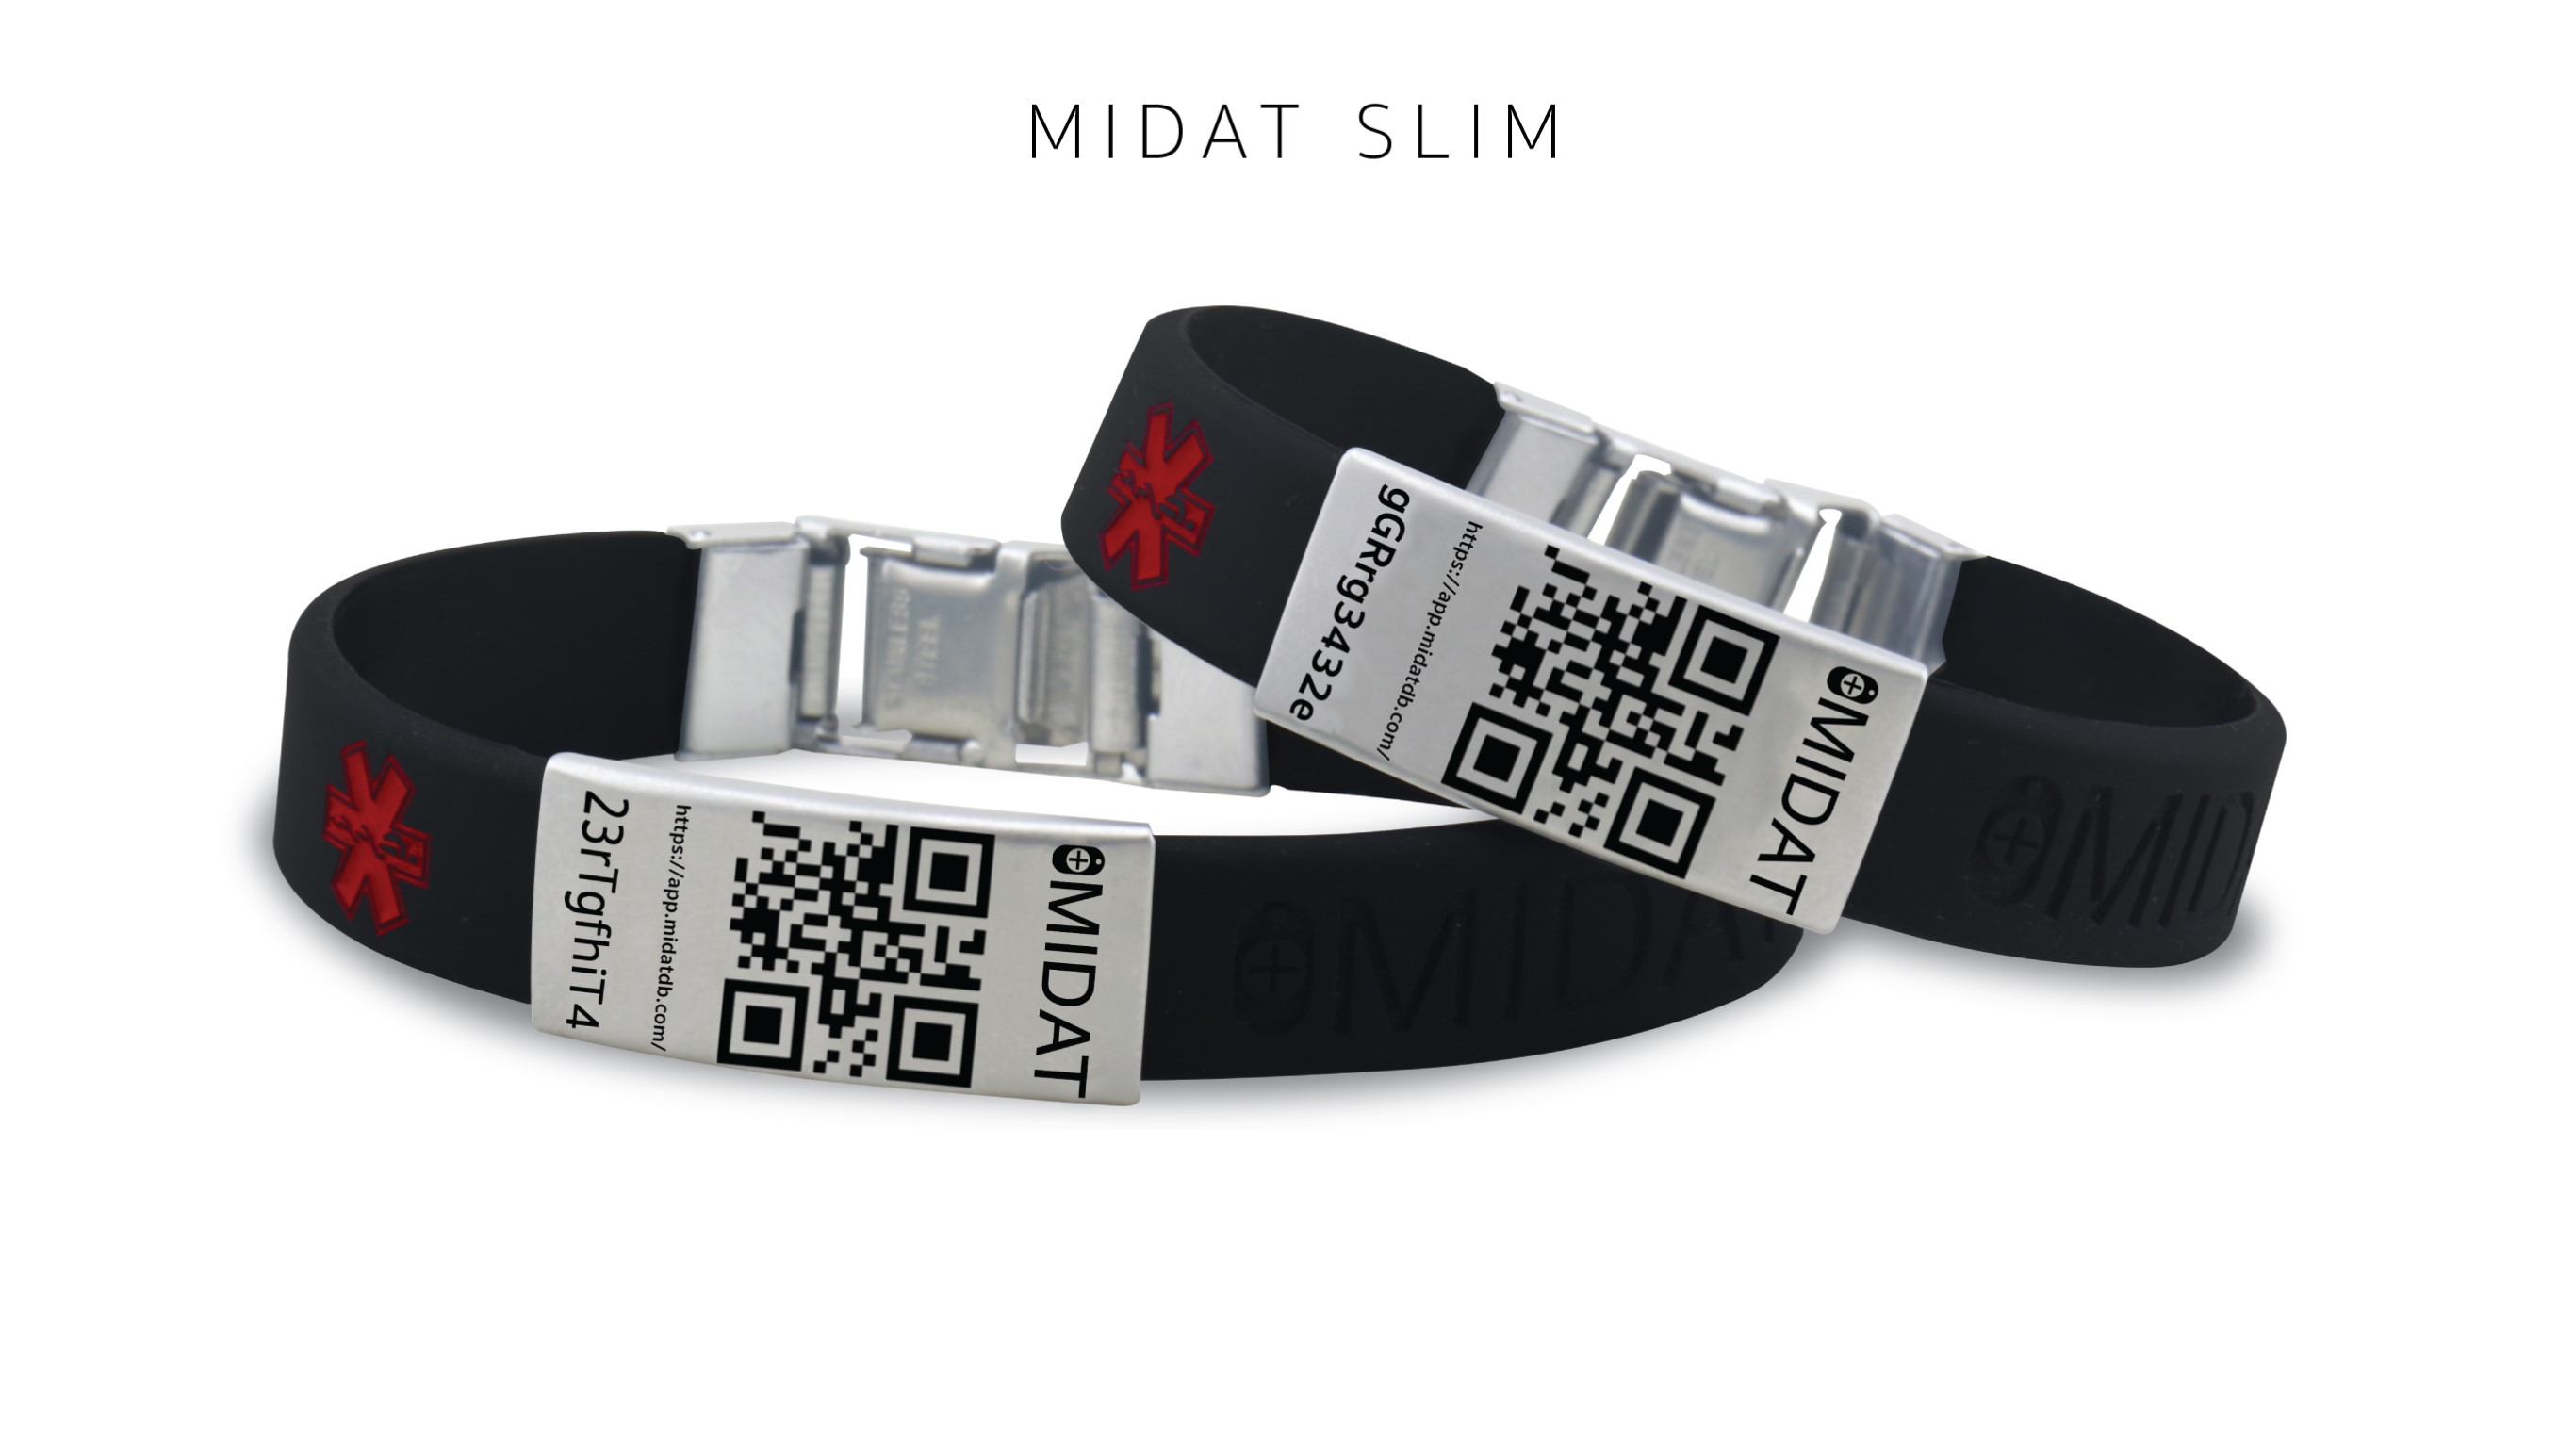 MIDAT SLIM qr code bracelet